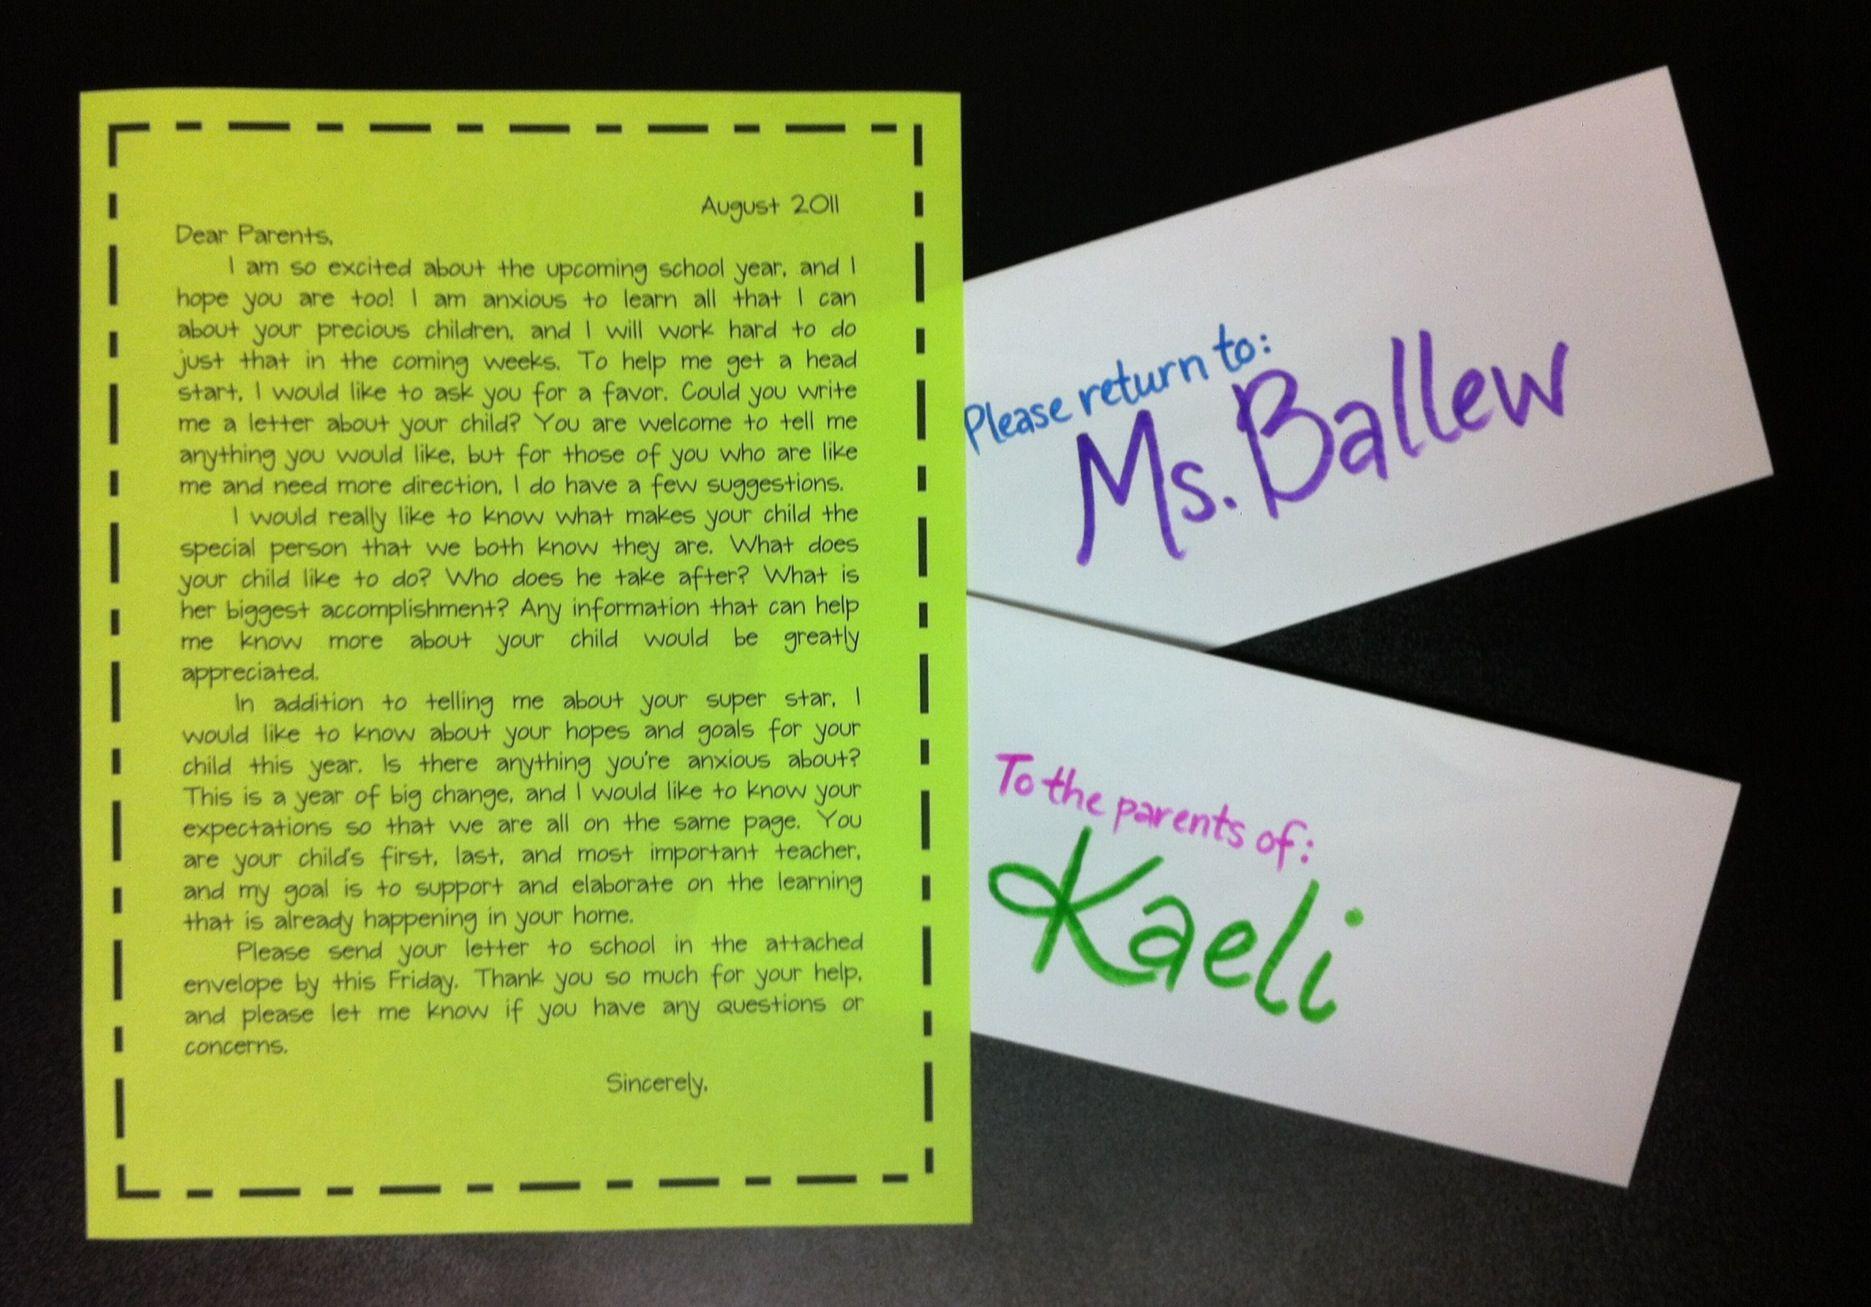 best images about student teacher introduction letter on 17 best images about student teacher introduction letter teacher portfolio student and teaching